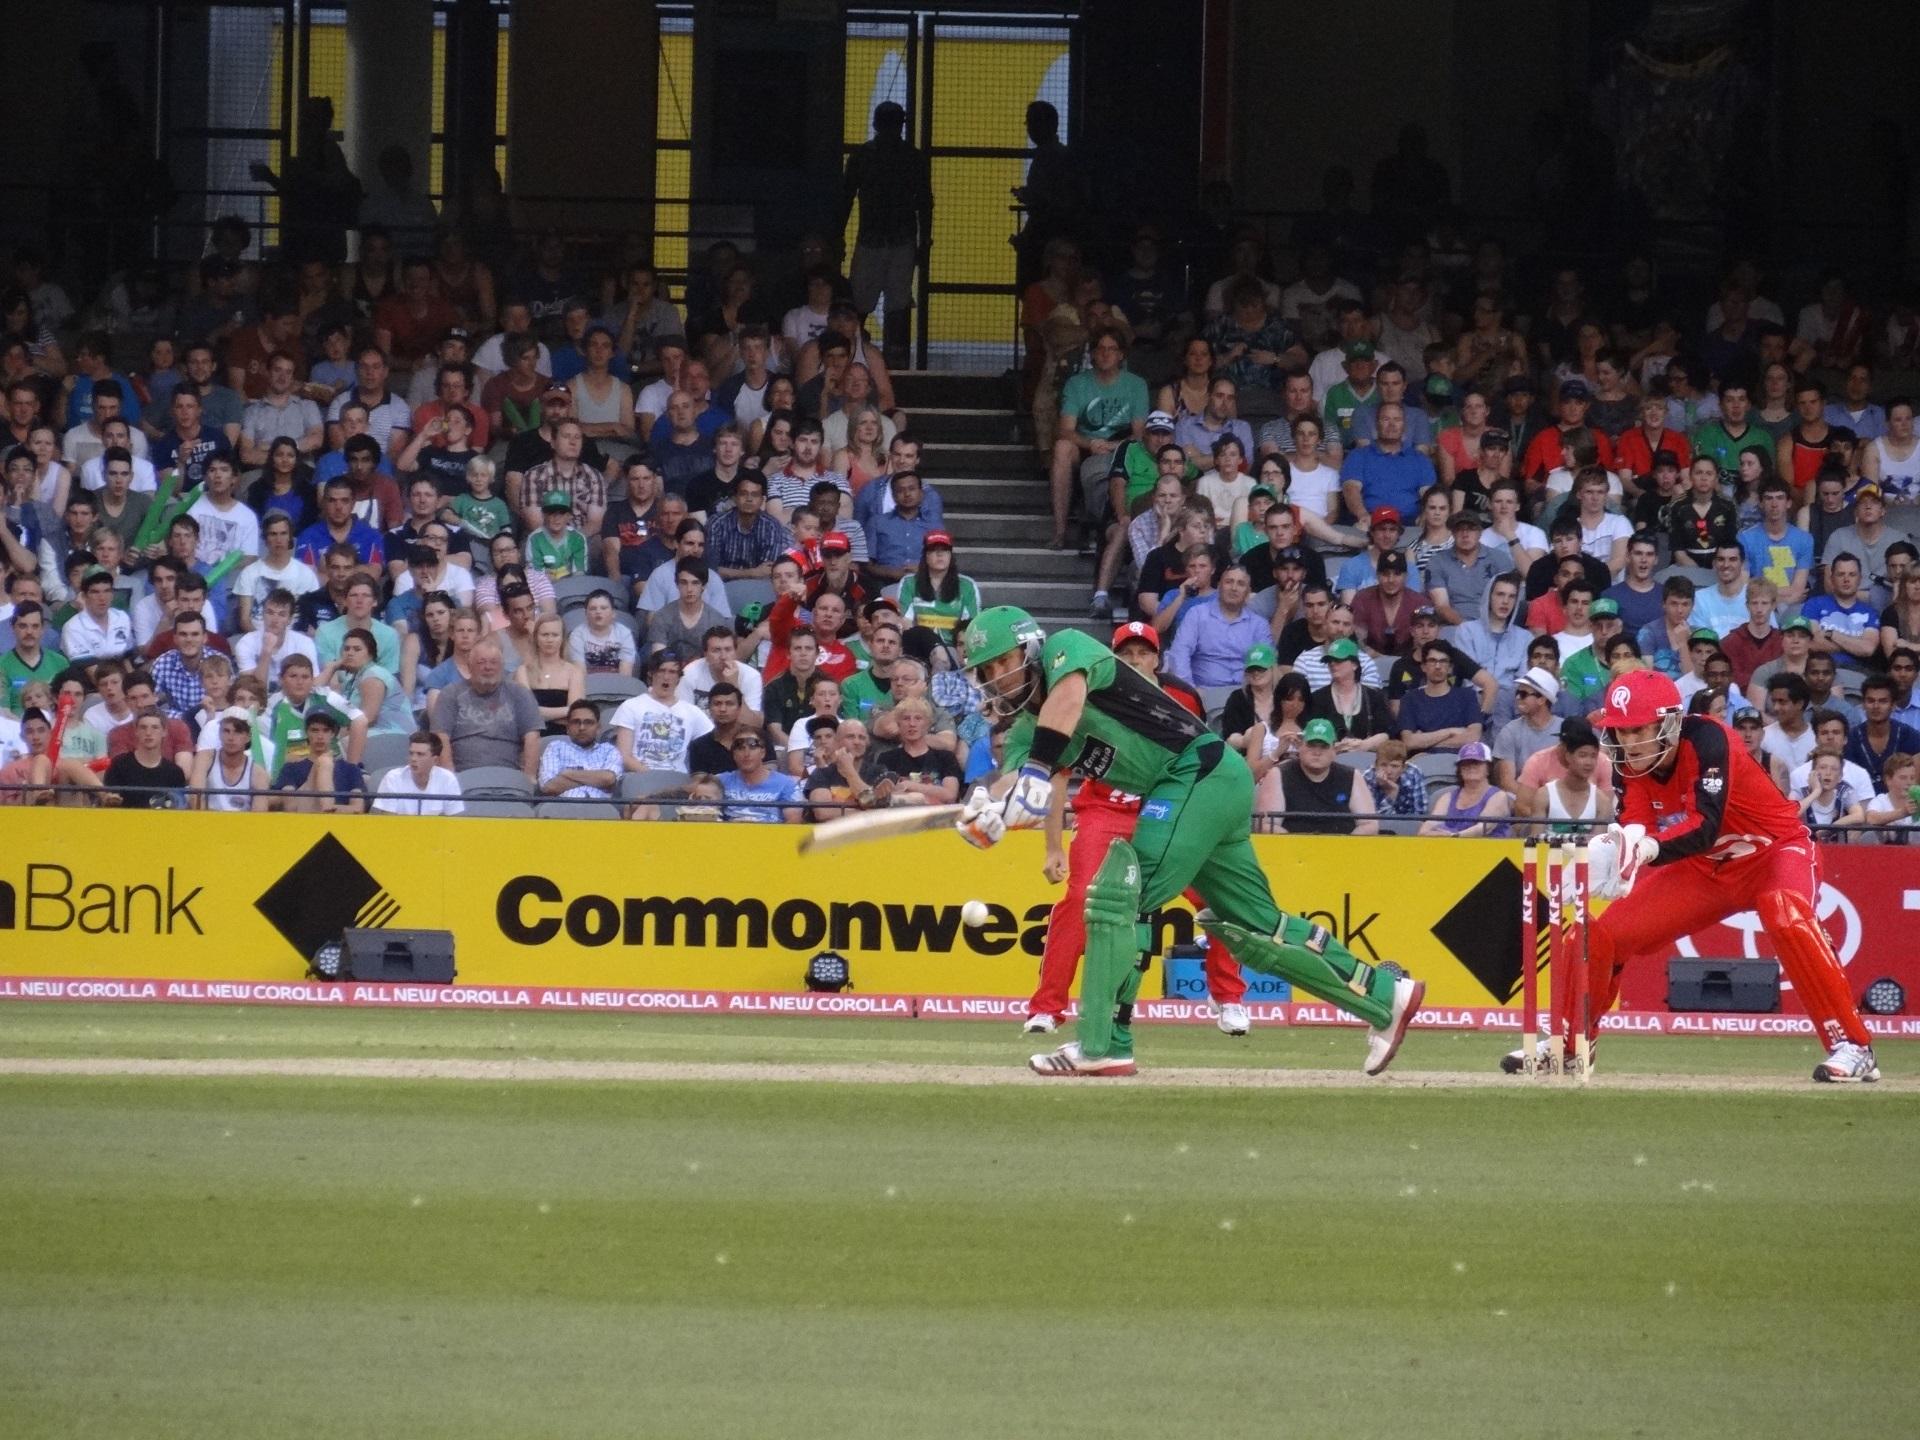 Cricket - T20 - Big Bash - Australia